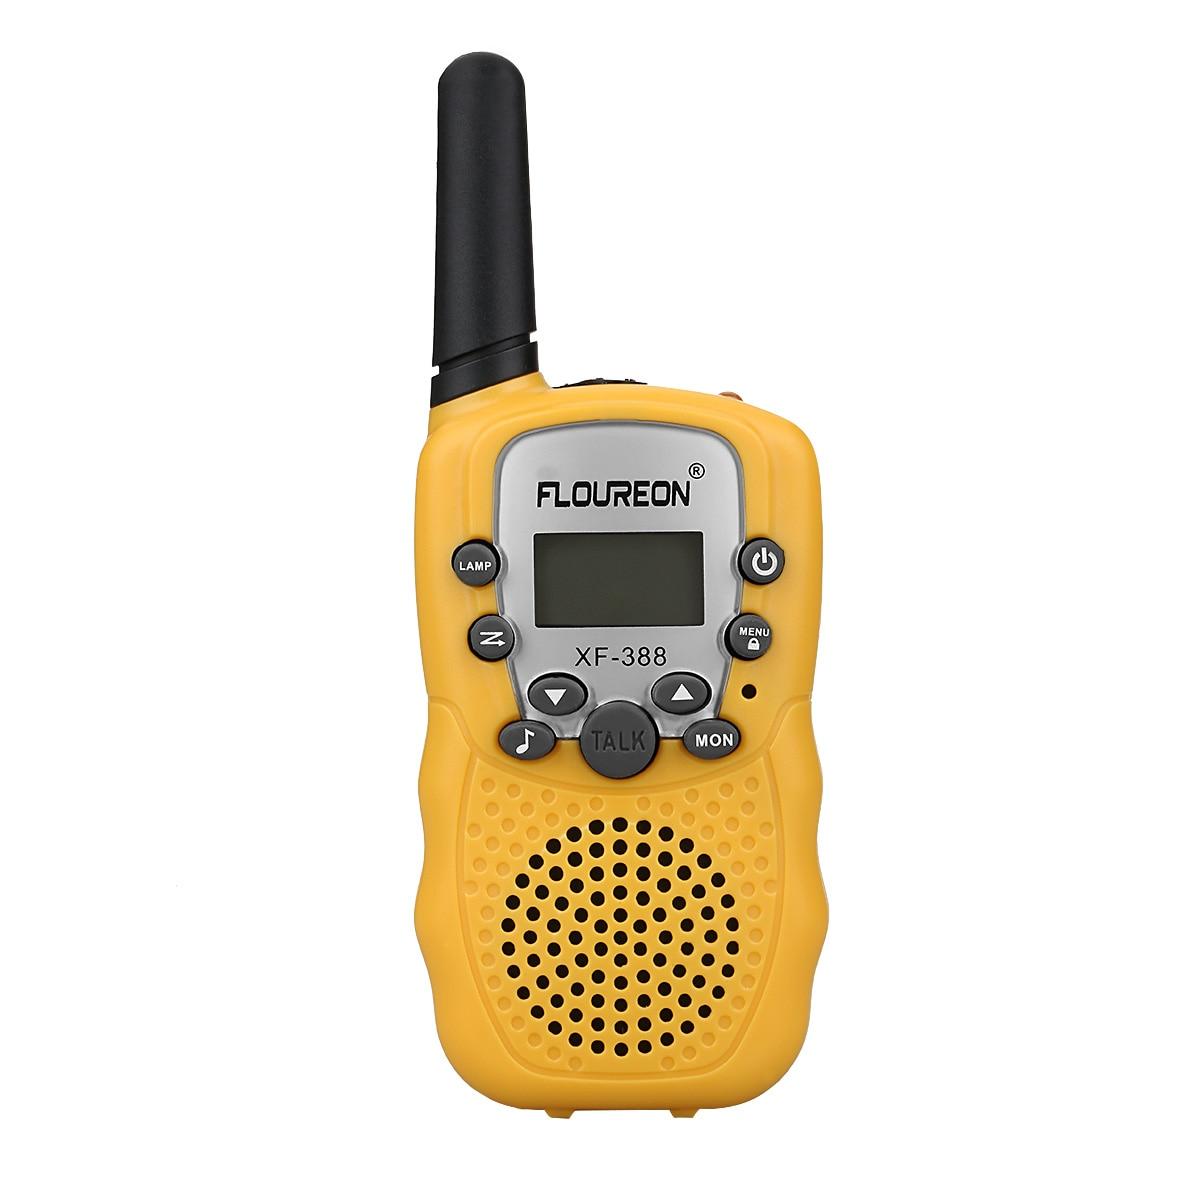 Türsprechstelle Floureon 1 Para 8 Kanal Walkie Talkies Uhf400-470mhz Lcd Display Amateur Zwei-weg Radio Schwarz Mini Kinder Radio Retevis